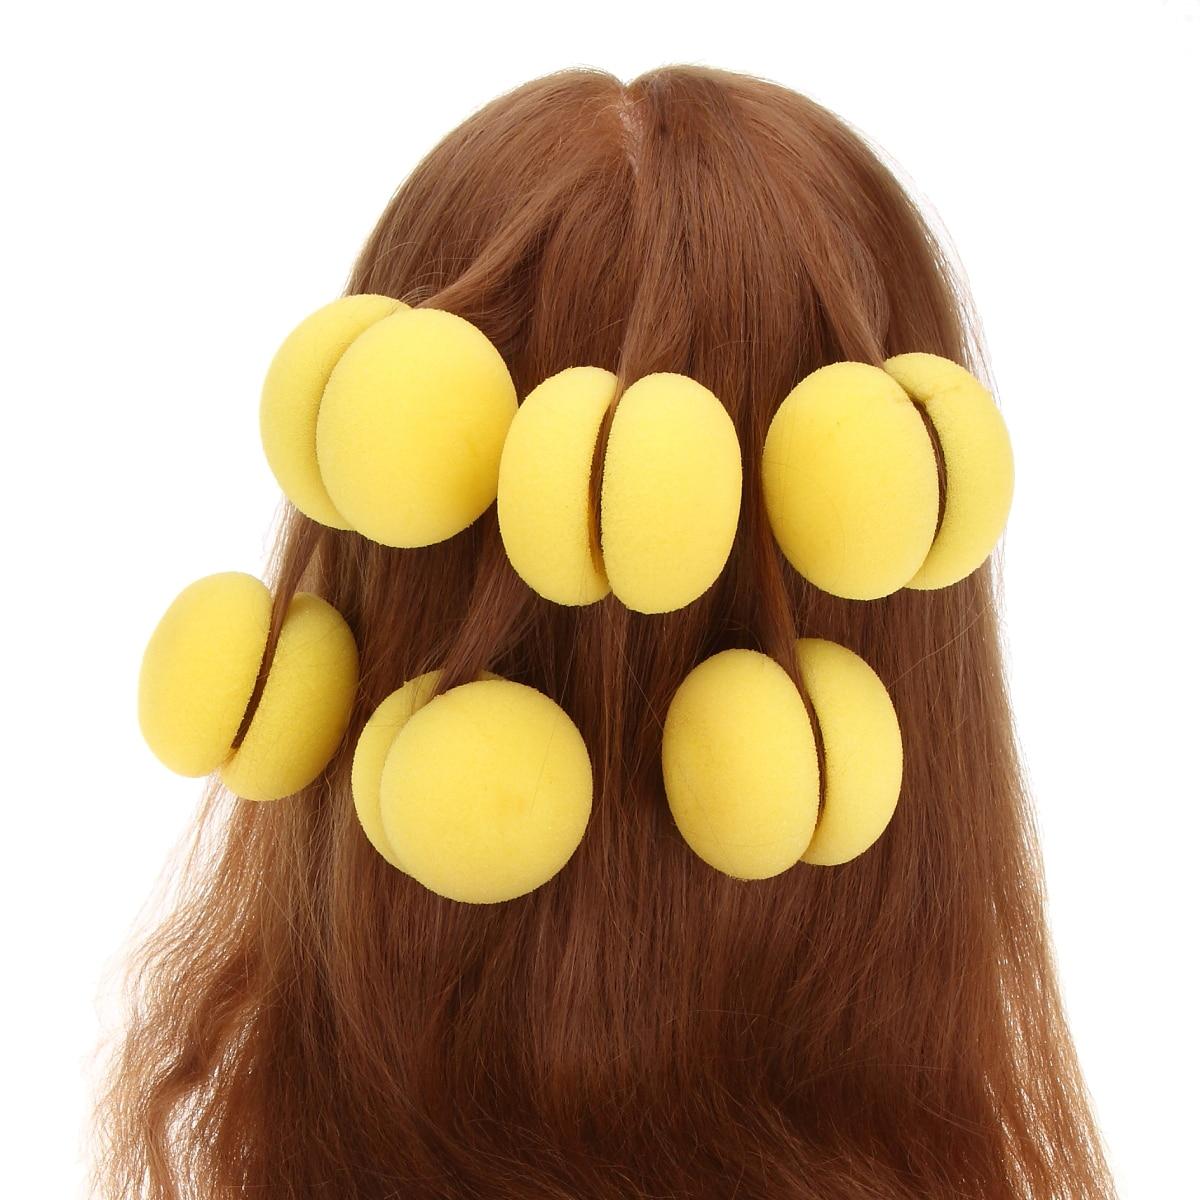 6pcs/set Magic Sponge Hair Curler Rollers Beauty Hair Care ...